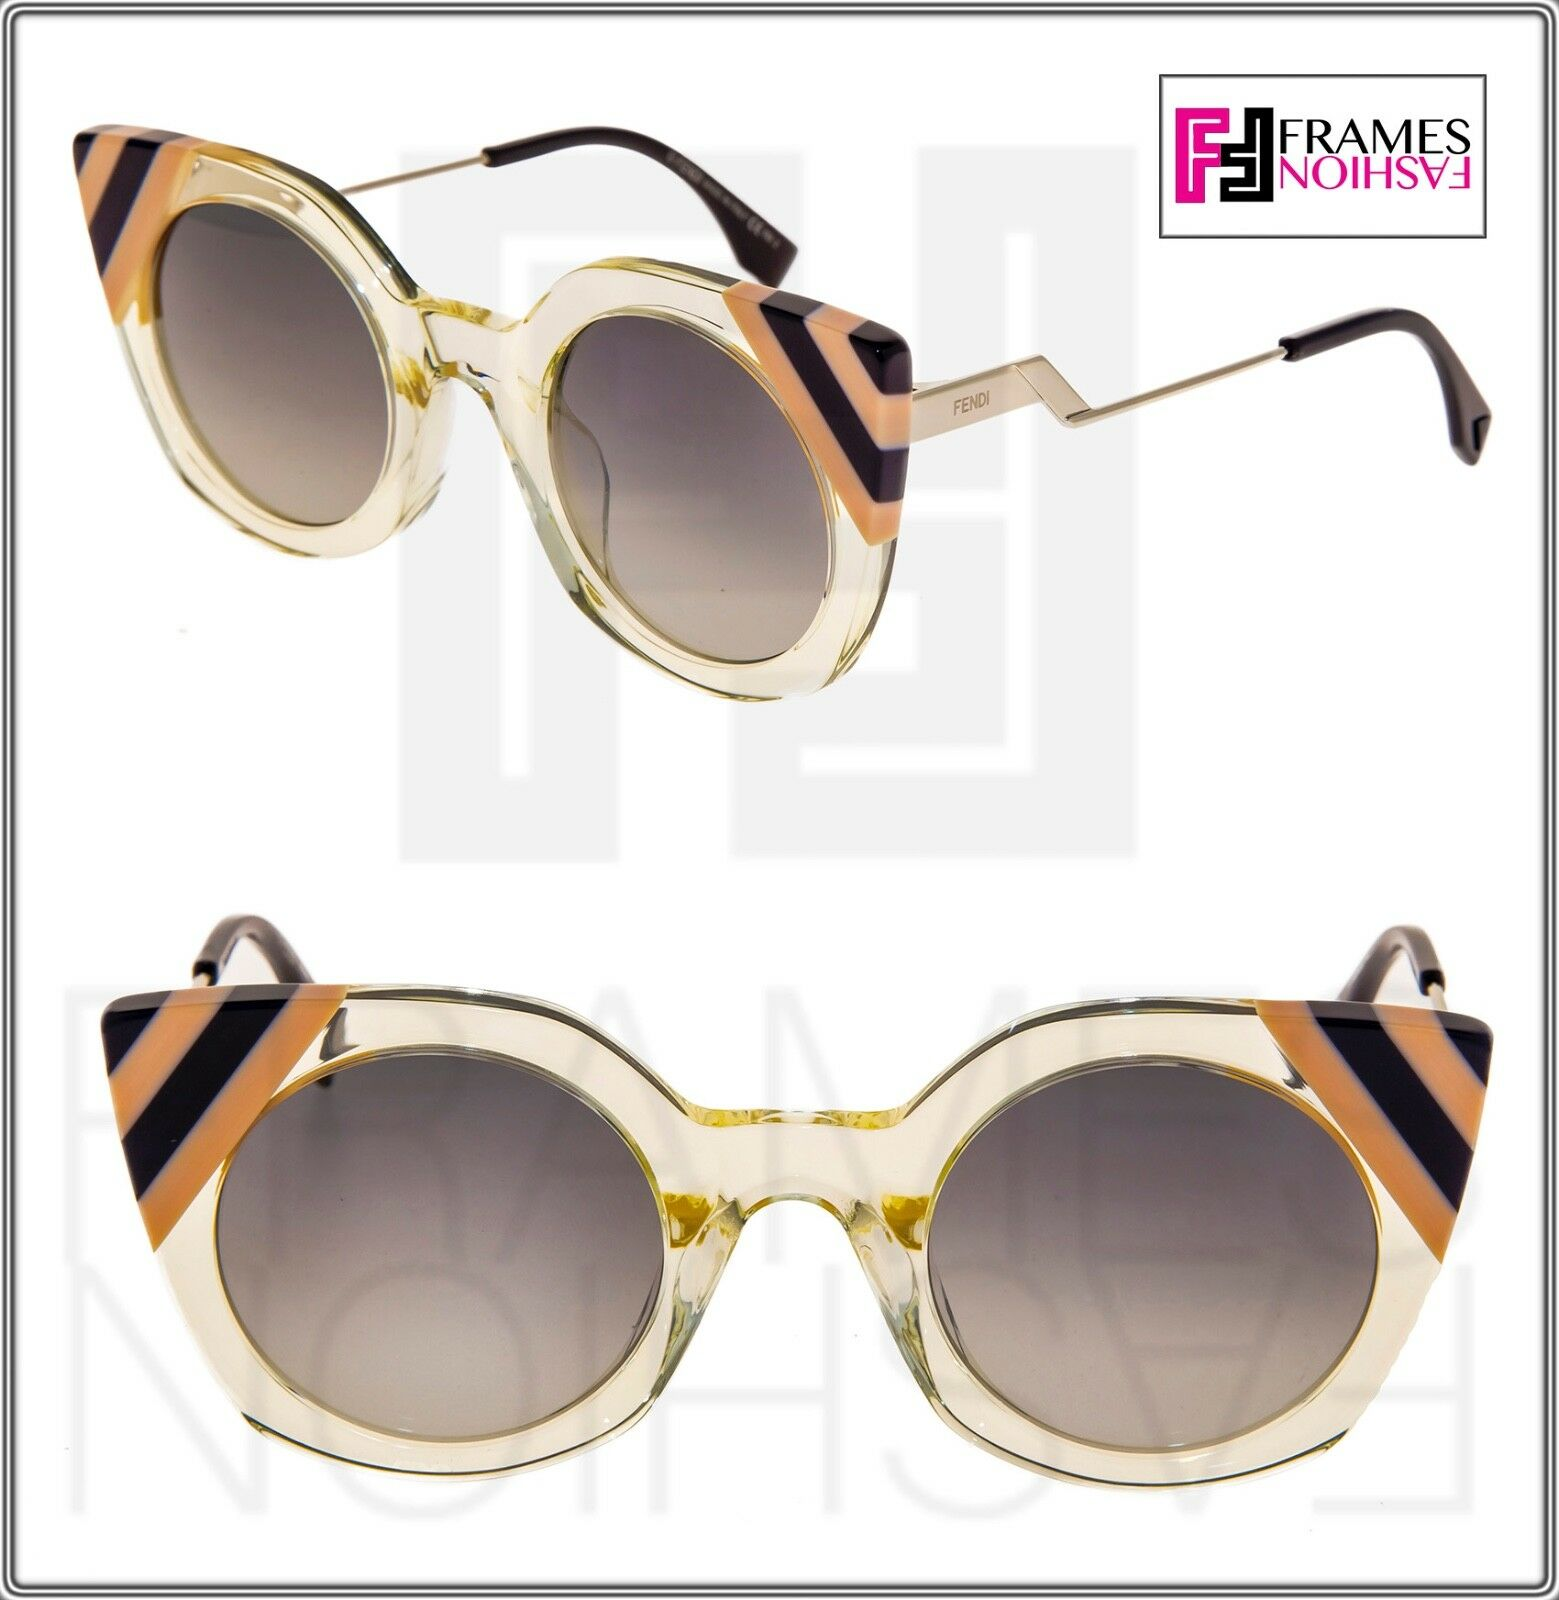 FENDI Waves 0240 FF0240 Crystal Yellow Stripe Grey Gradient Sunglasses Cat Eye